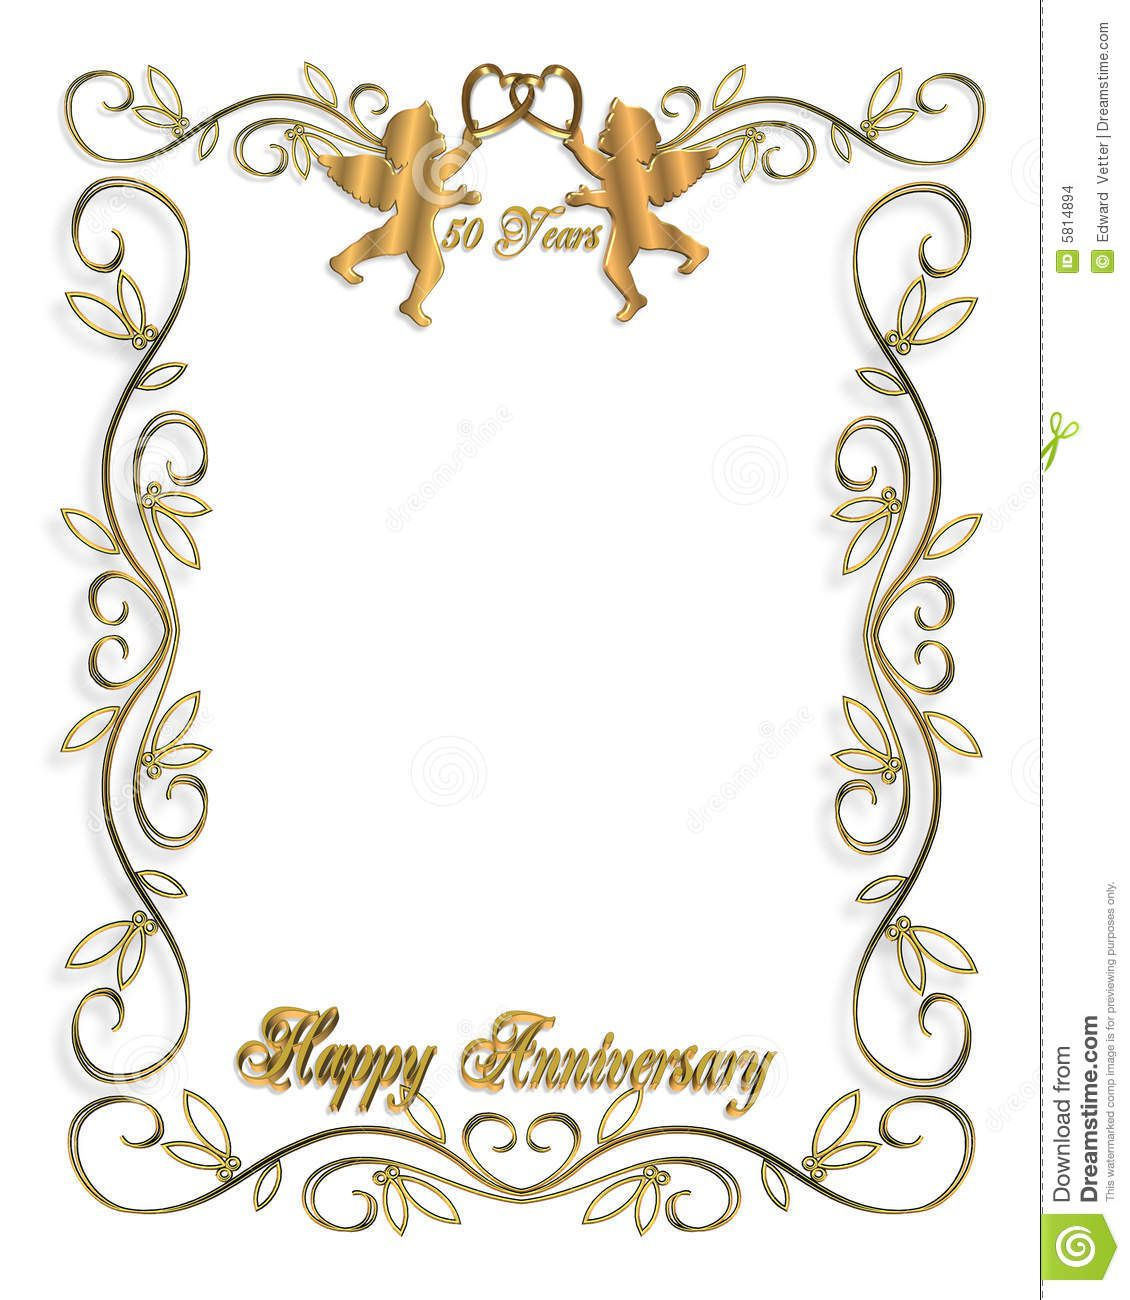 010 Striking 50th Anniversary Invitation Template Free Design  Download Golden WeddingFull